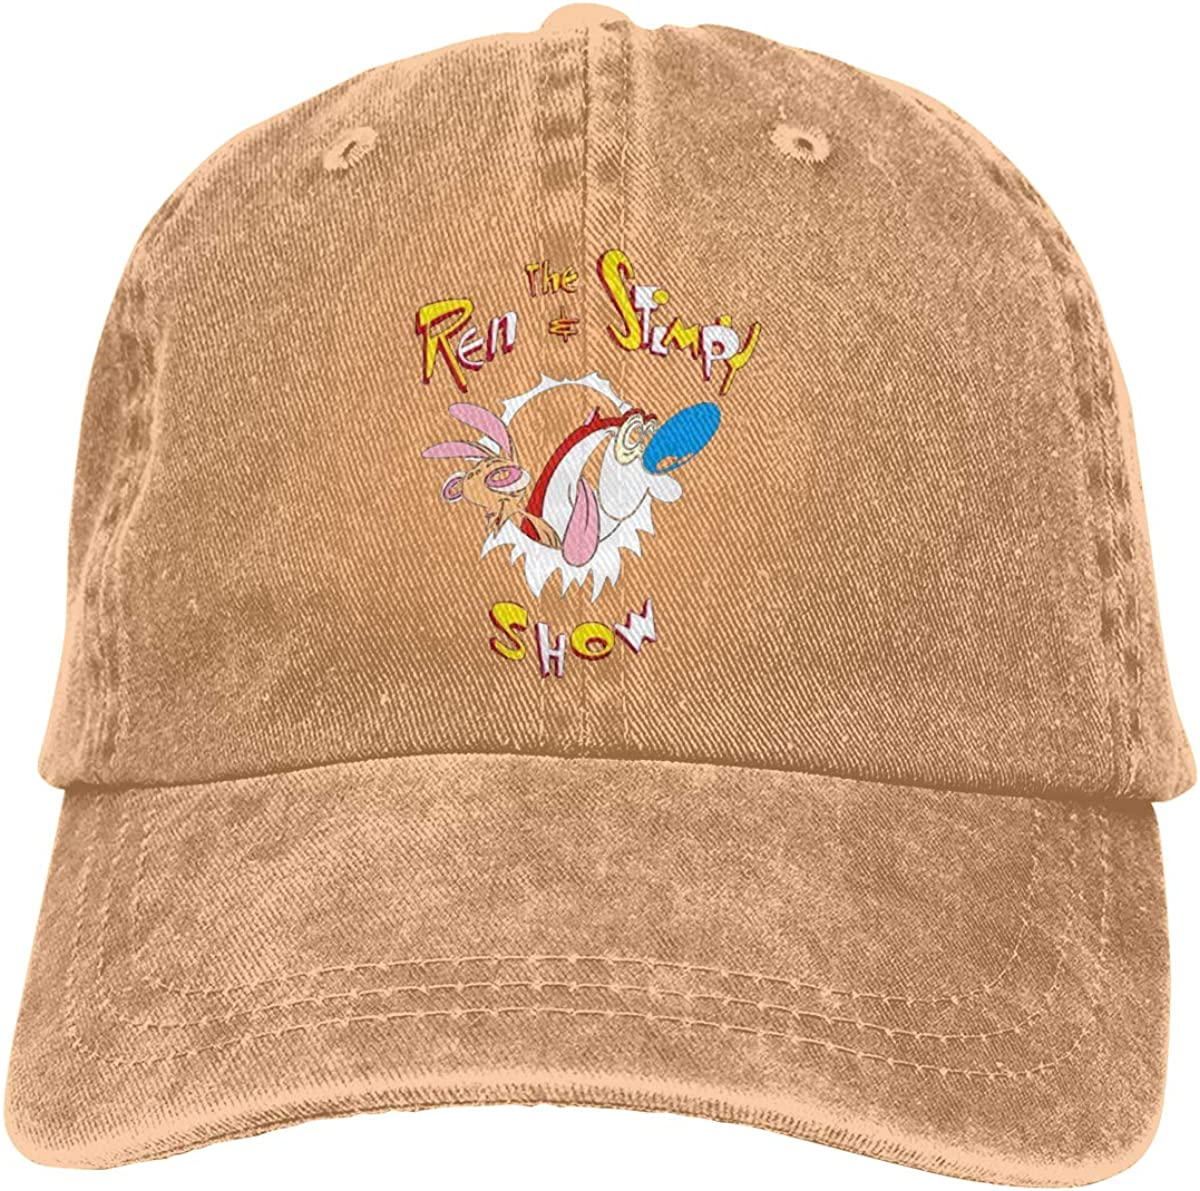 Zlizhi Funny The Ren and Stimpy Show Logo Men Women Plain Cotton Adjustable Washed Twill Low Profile Baseball Cap Hat